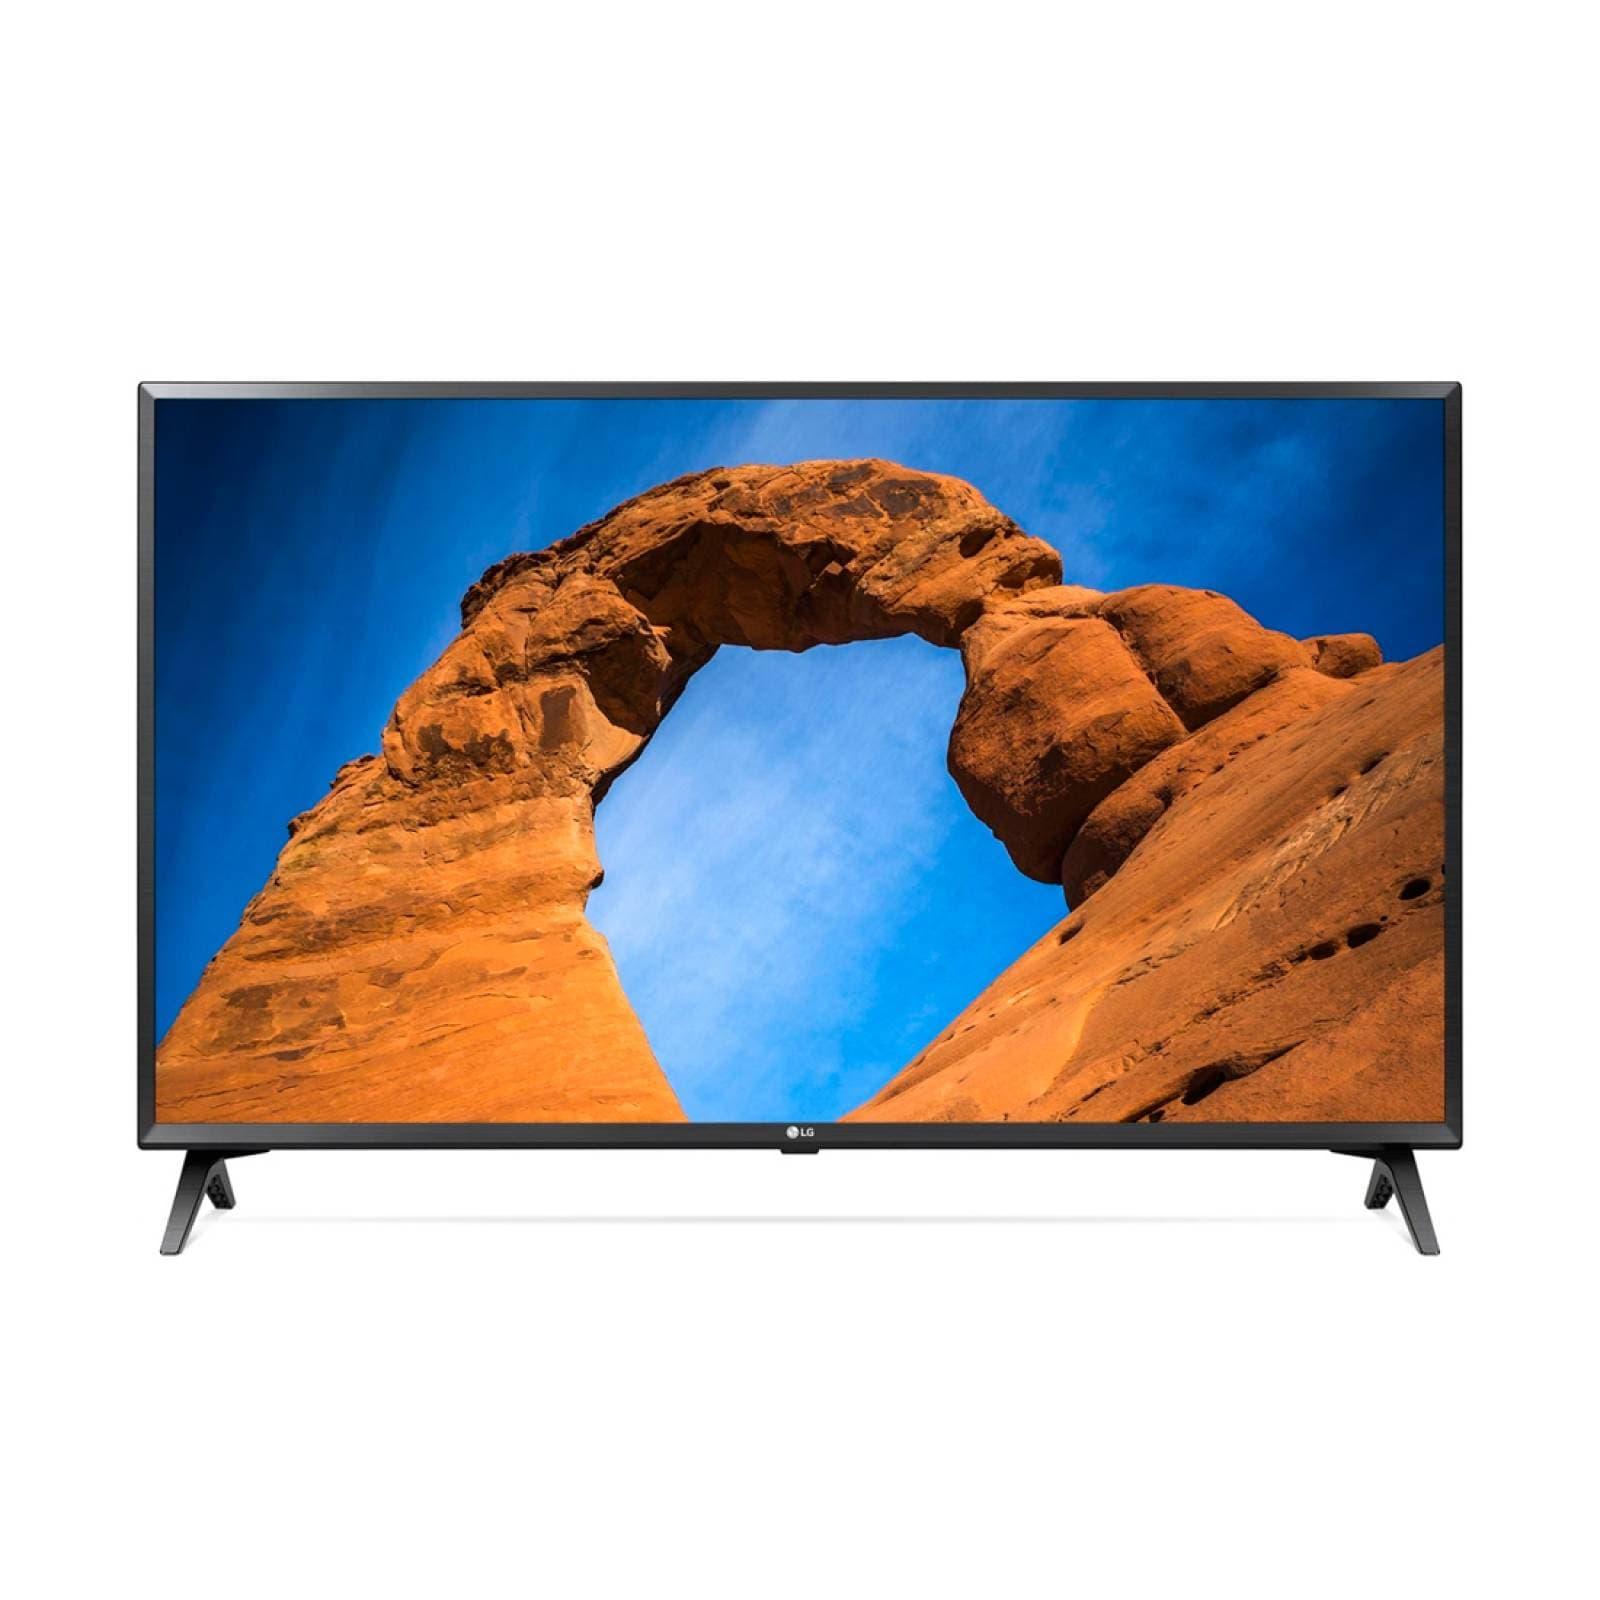 Smart TV 32 Pul LCD HD 60Hz WebOS WiFi HDMI Negro 32LK540 LG